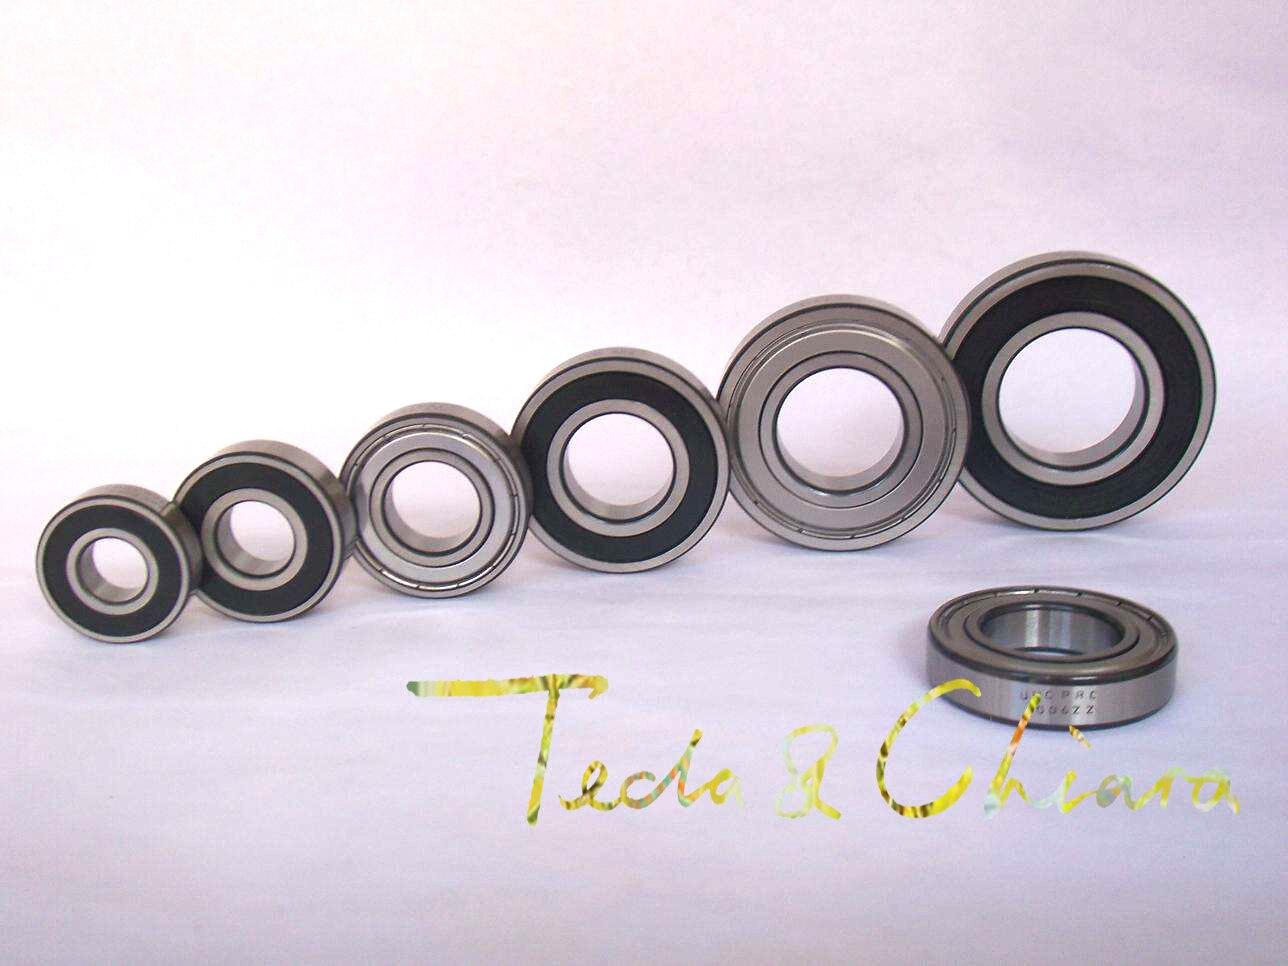 6000 6000ZZ 6000RS 6000-2Z 6000Z 6000-2RS ZZ RS RZ 2RZ Deep Groove Ball Bearings 10 X 26 X 8mm High Quality(China)